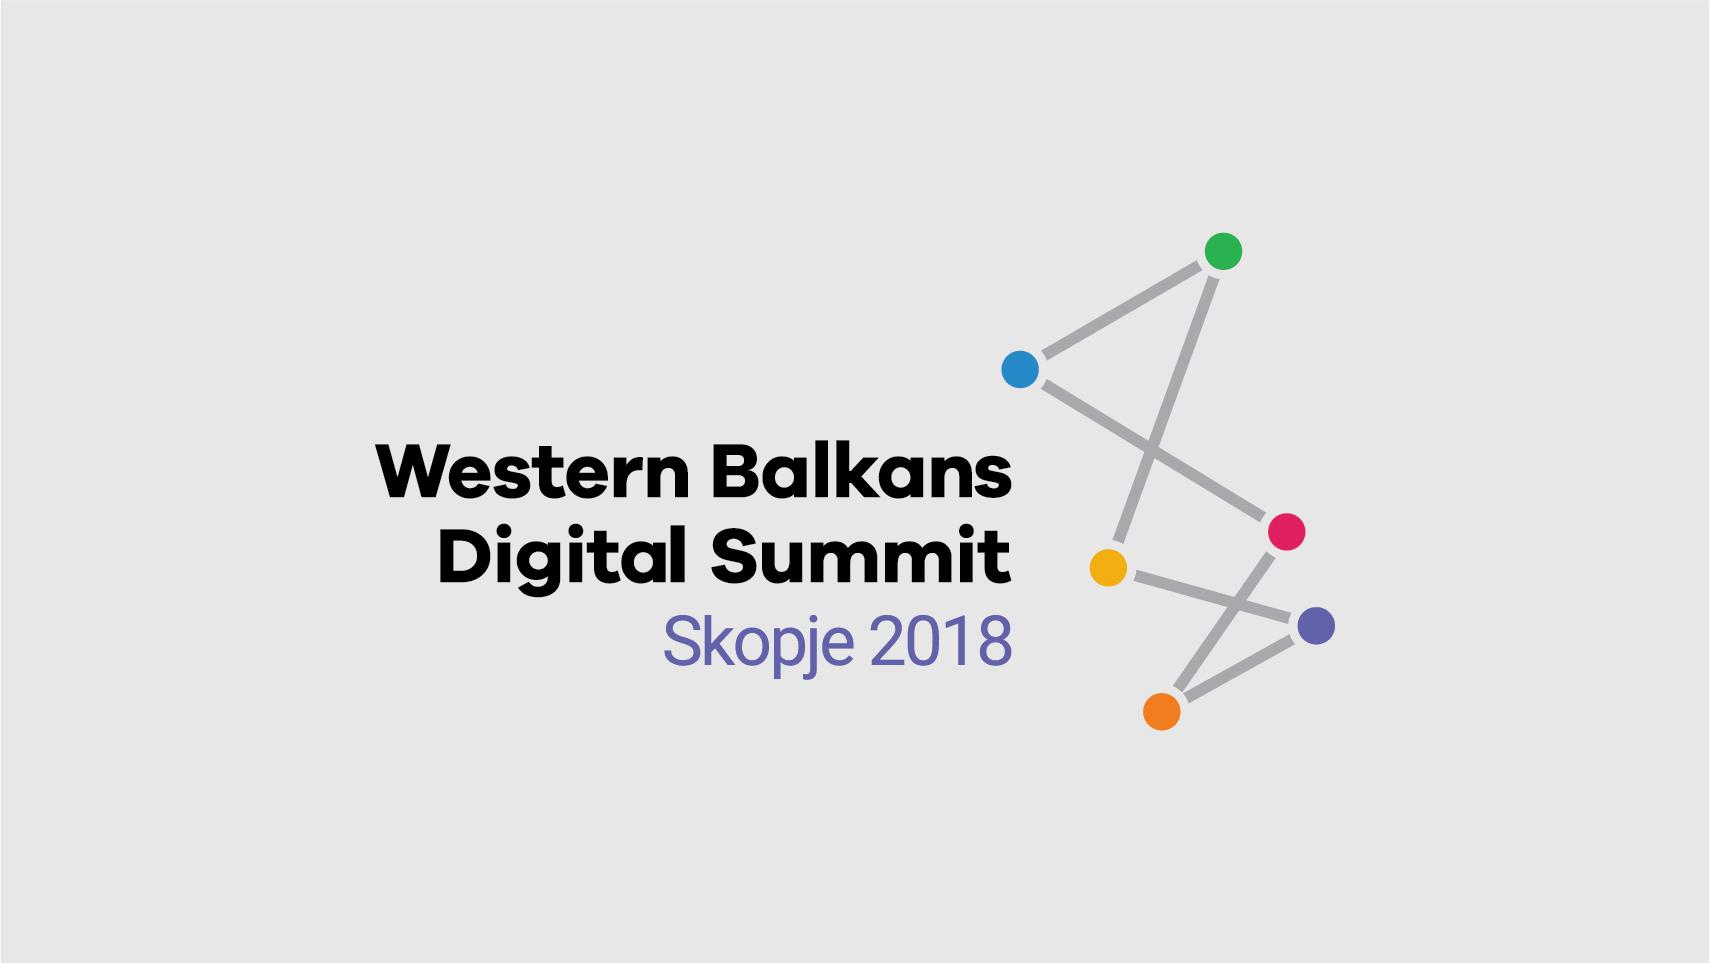 Verso Altima Group – partner of Western Balkans Digital Summit